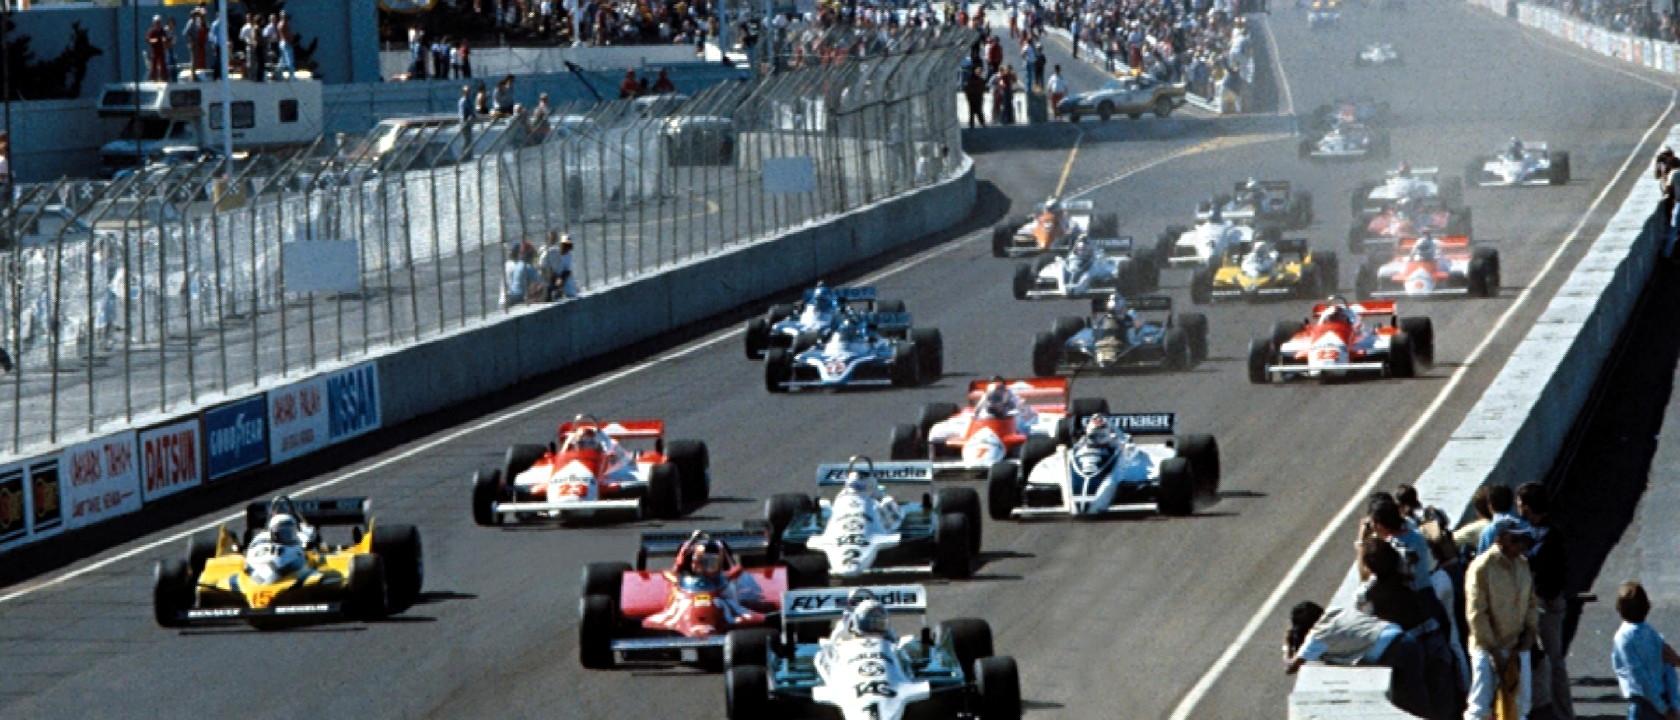 1981 Caesars Palace Grand Prix Formula One Art Genius